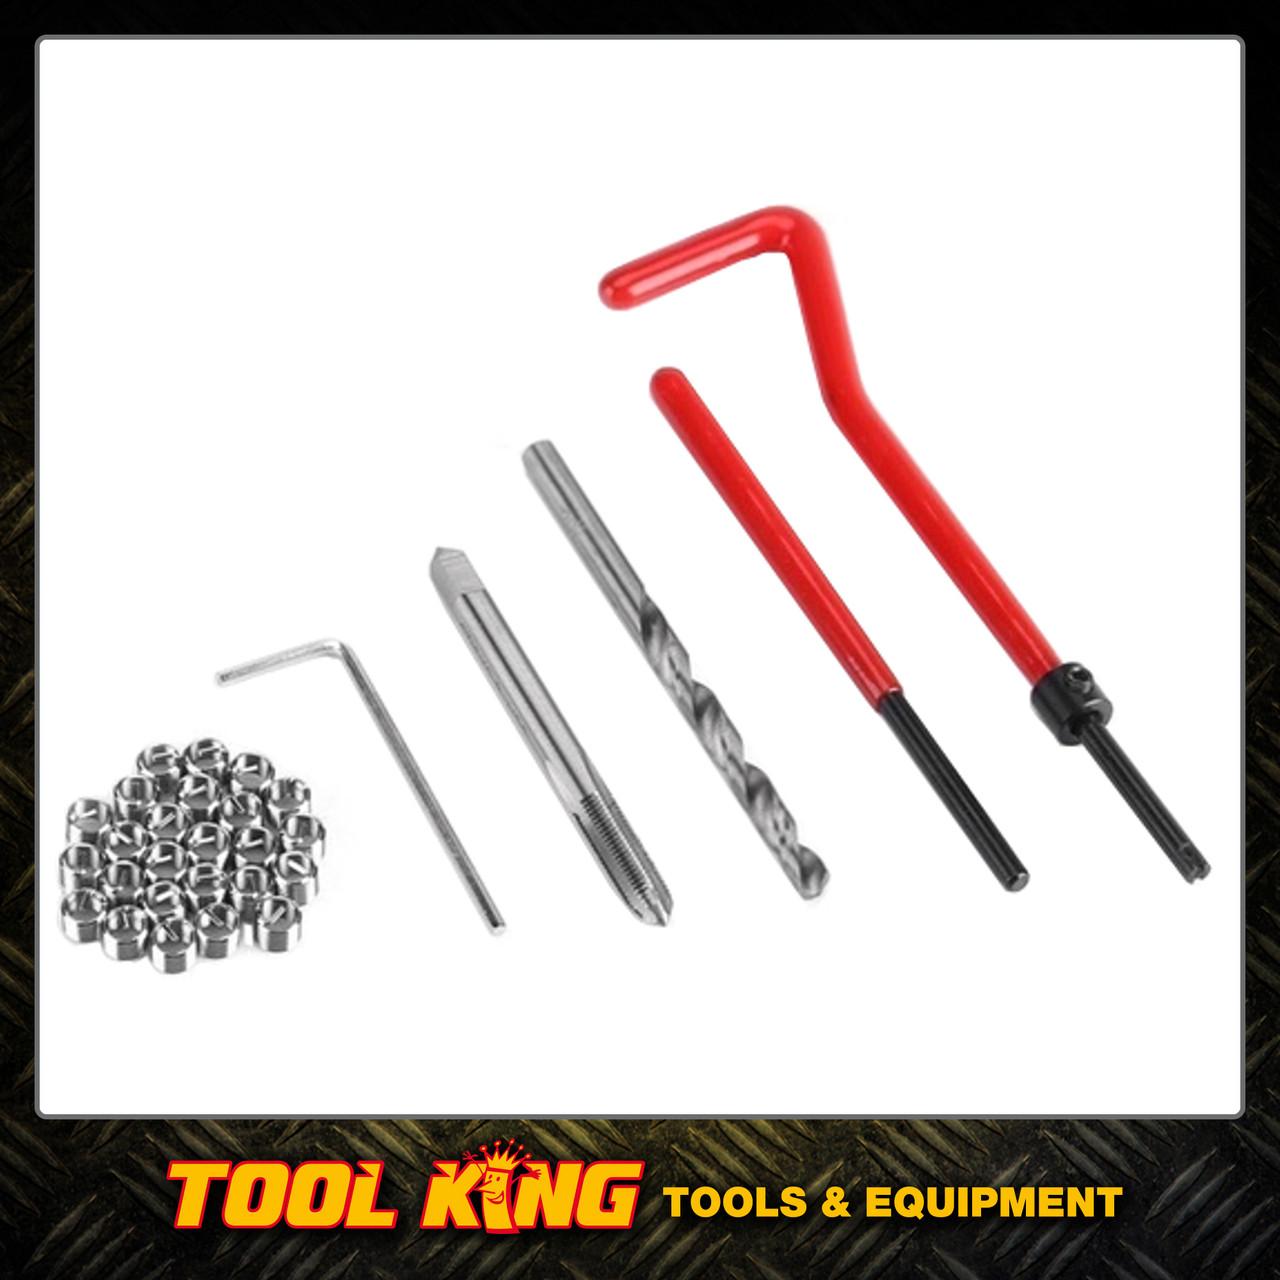 Thread repair helicoil insert kit M8 x 1.25